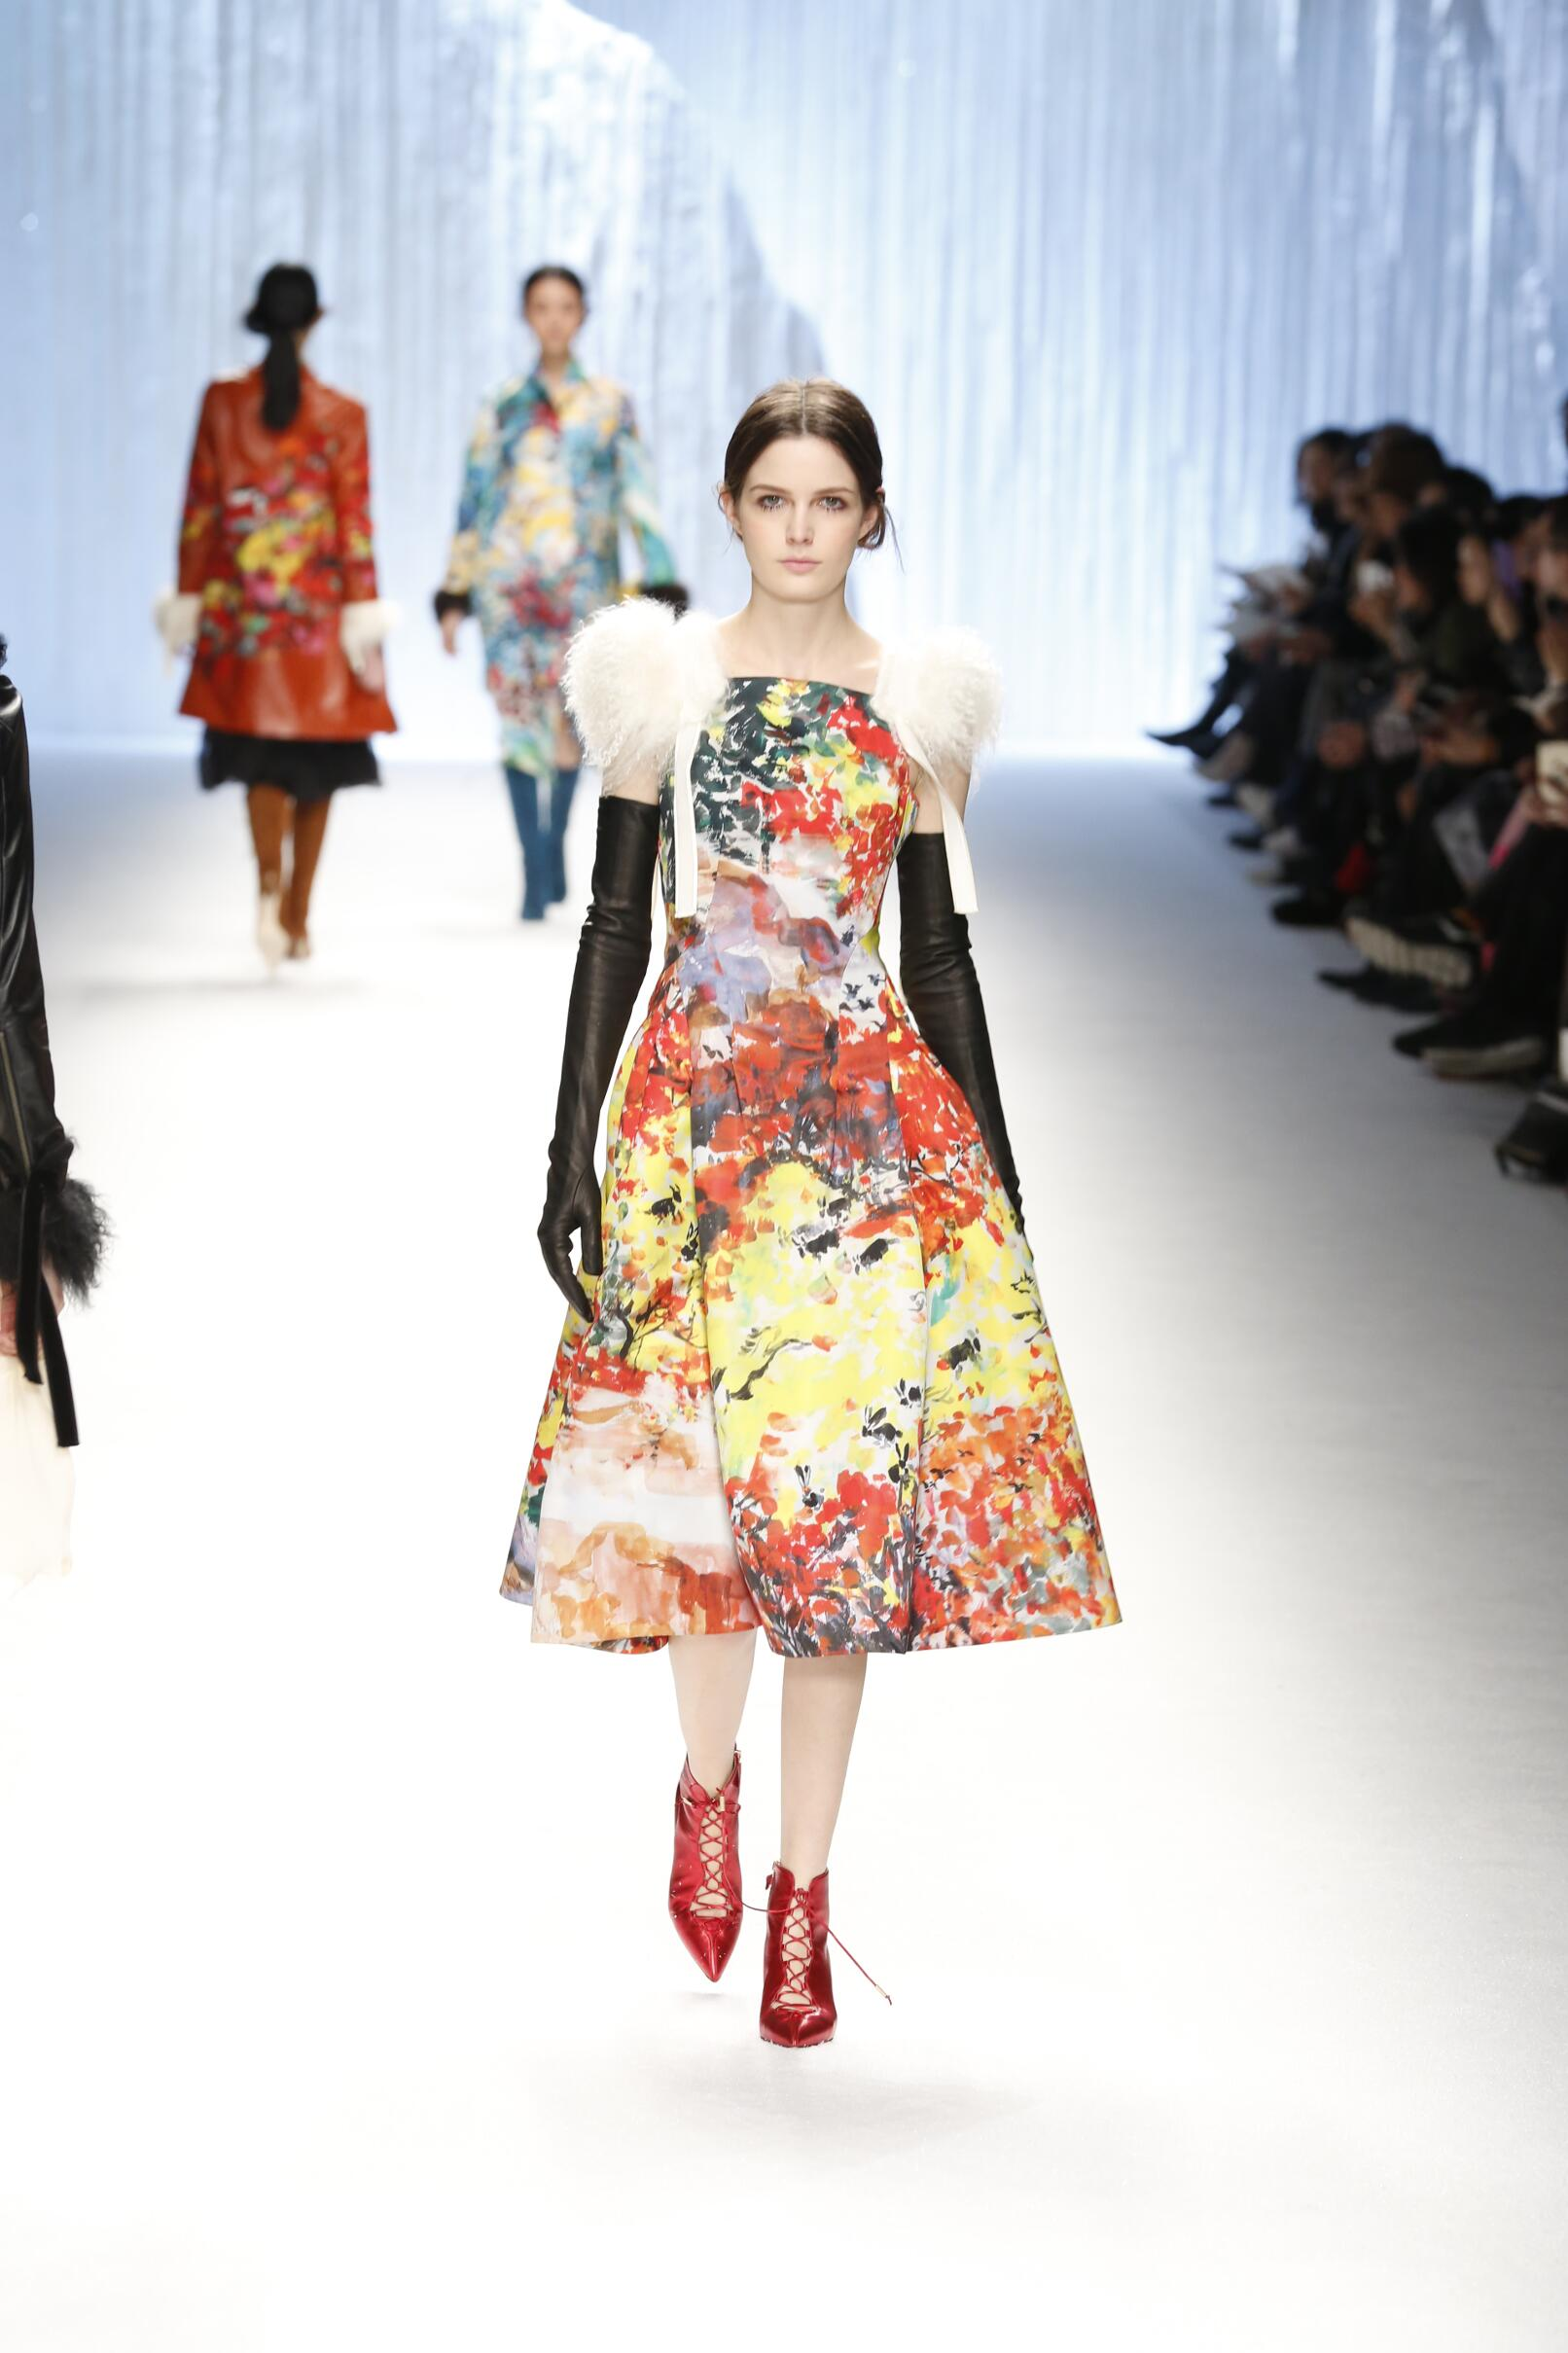 Catwalk Shiatzy Chen Womenswear Collection Winter 2015